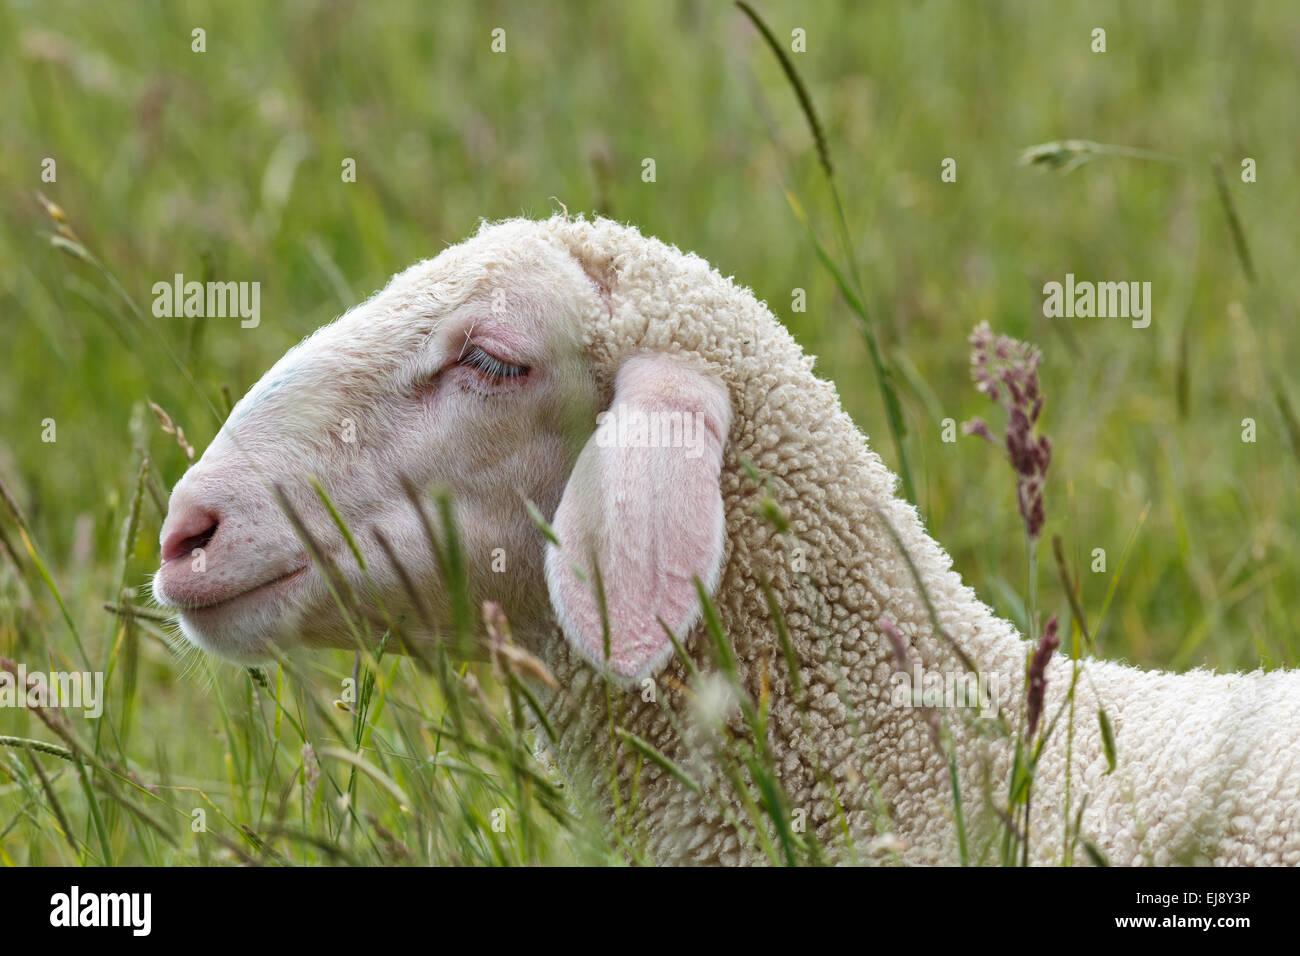 Young Merino Sheep portrait - Stock Image